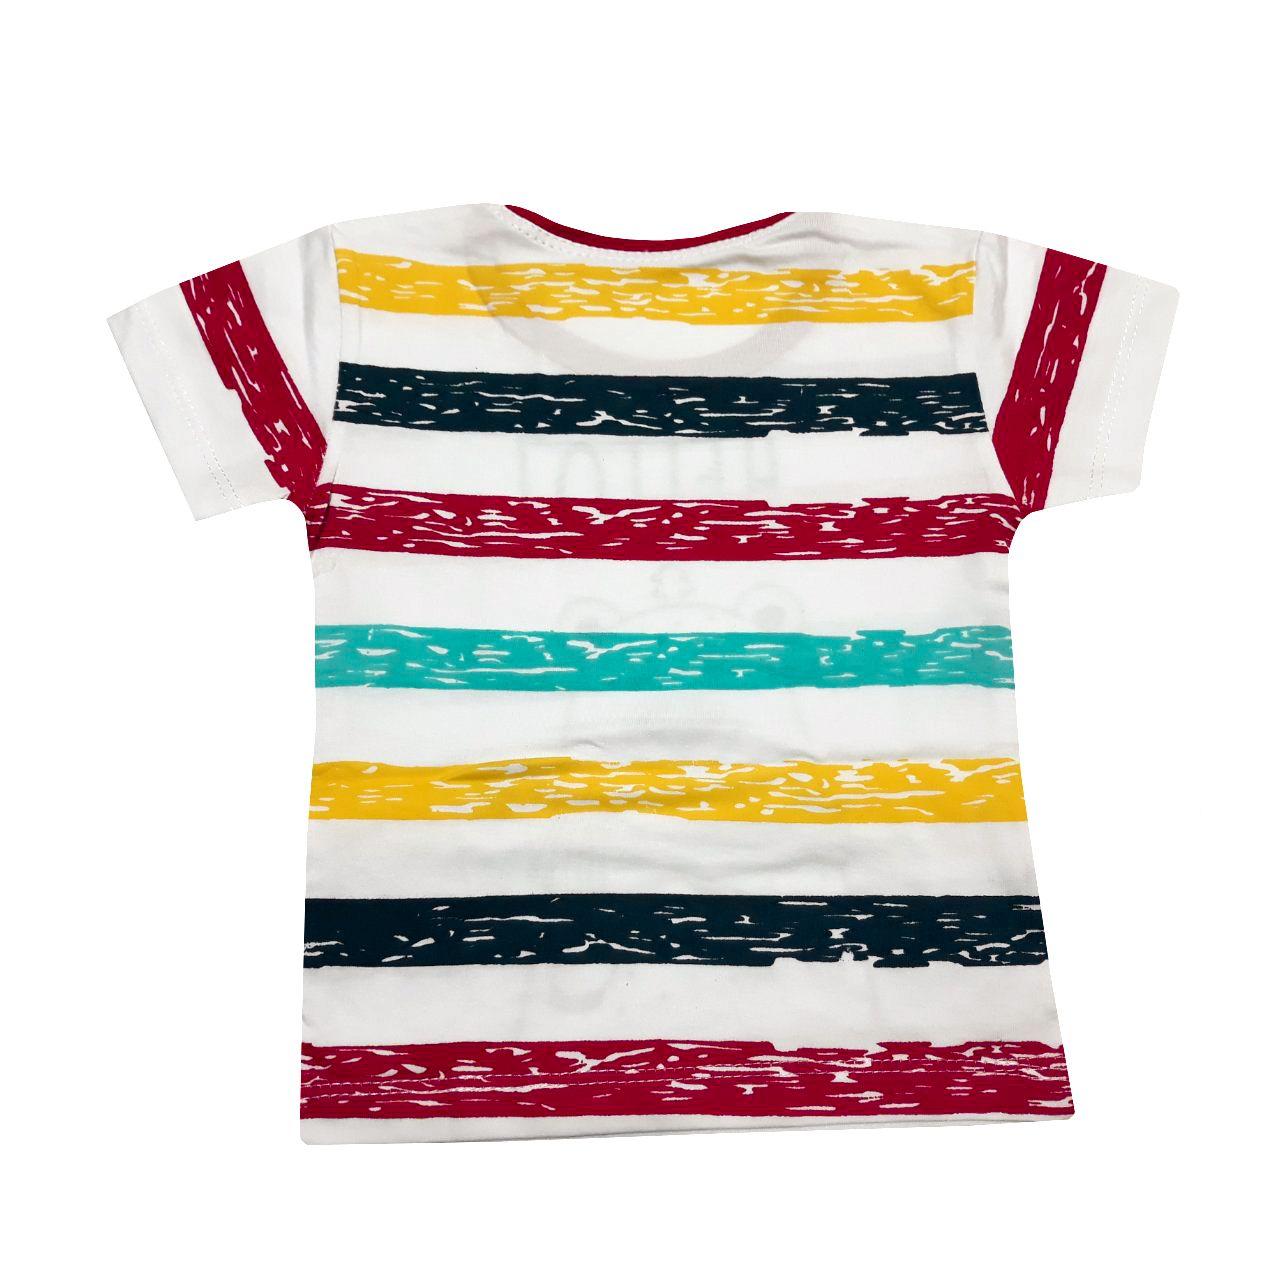 ست تی شرت و شلوارک پسرانه کد GH -  - 3